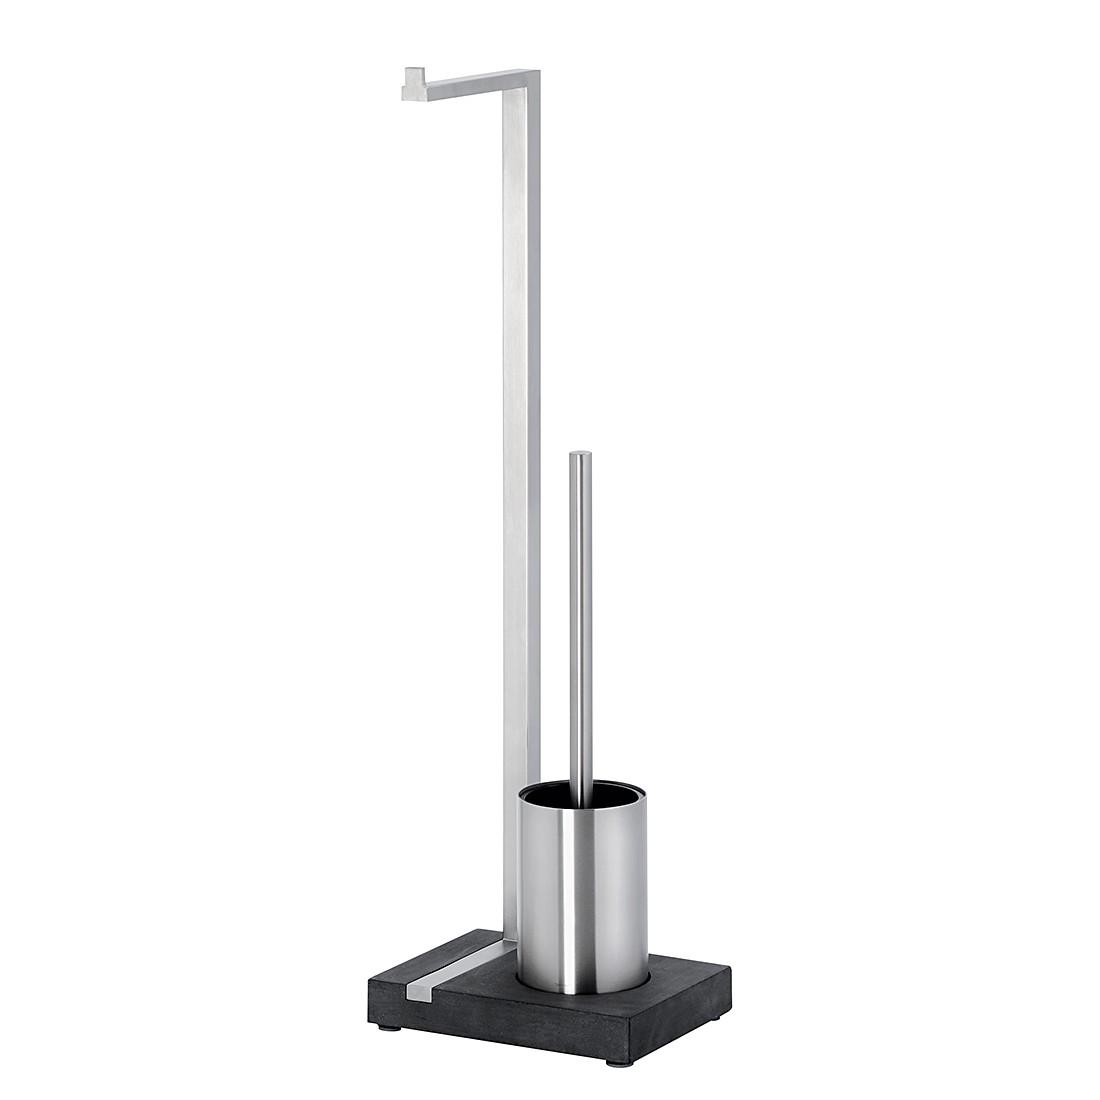 Toilettenbutler Menoto – Matt, Blomus günstig kaufen